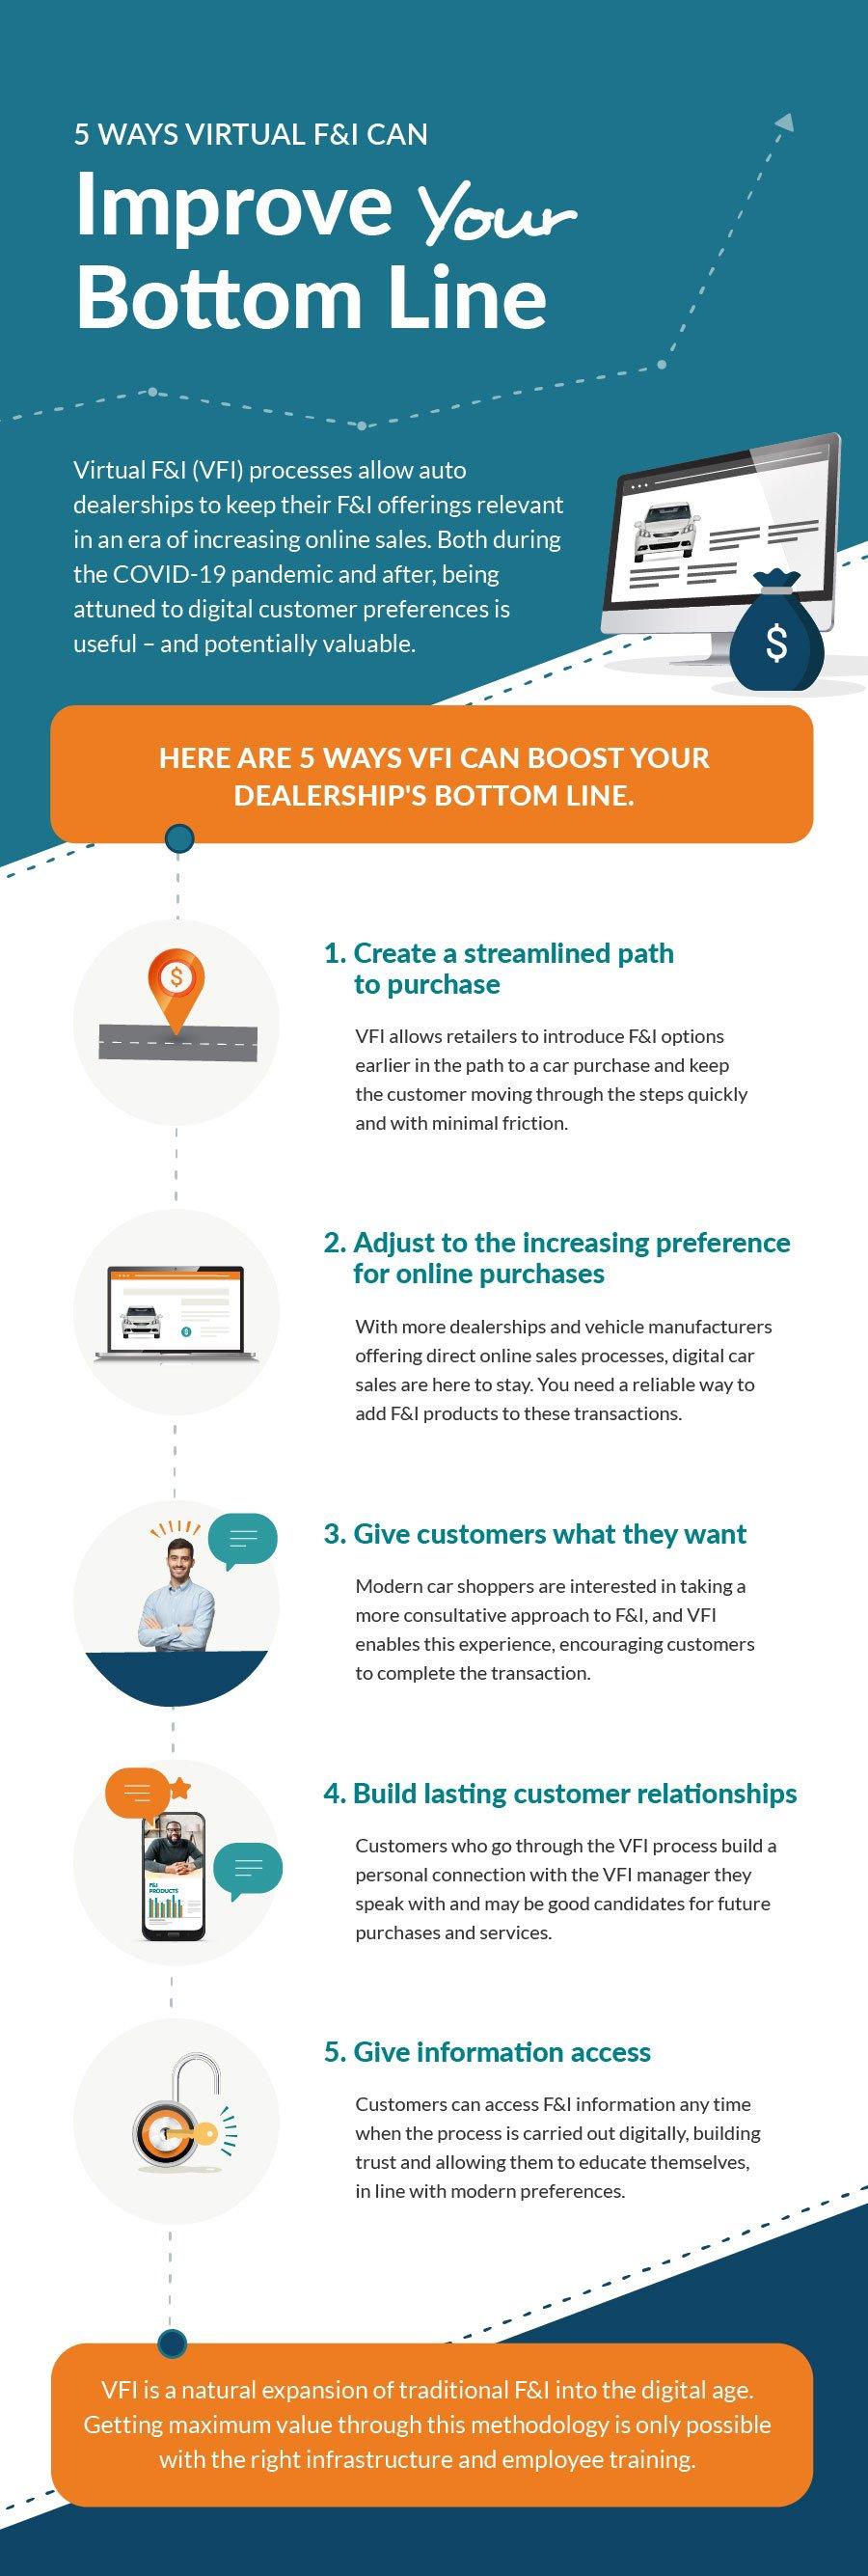 img-20200729-intro-to-vfi-improve-your-bottom-line-blog-infographic